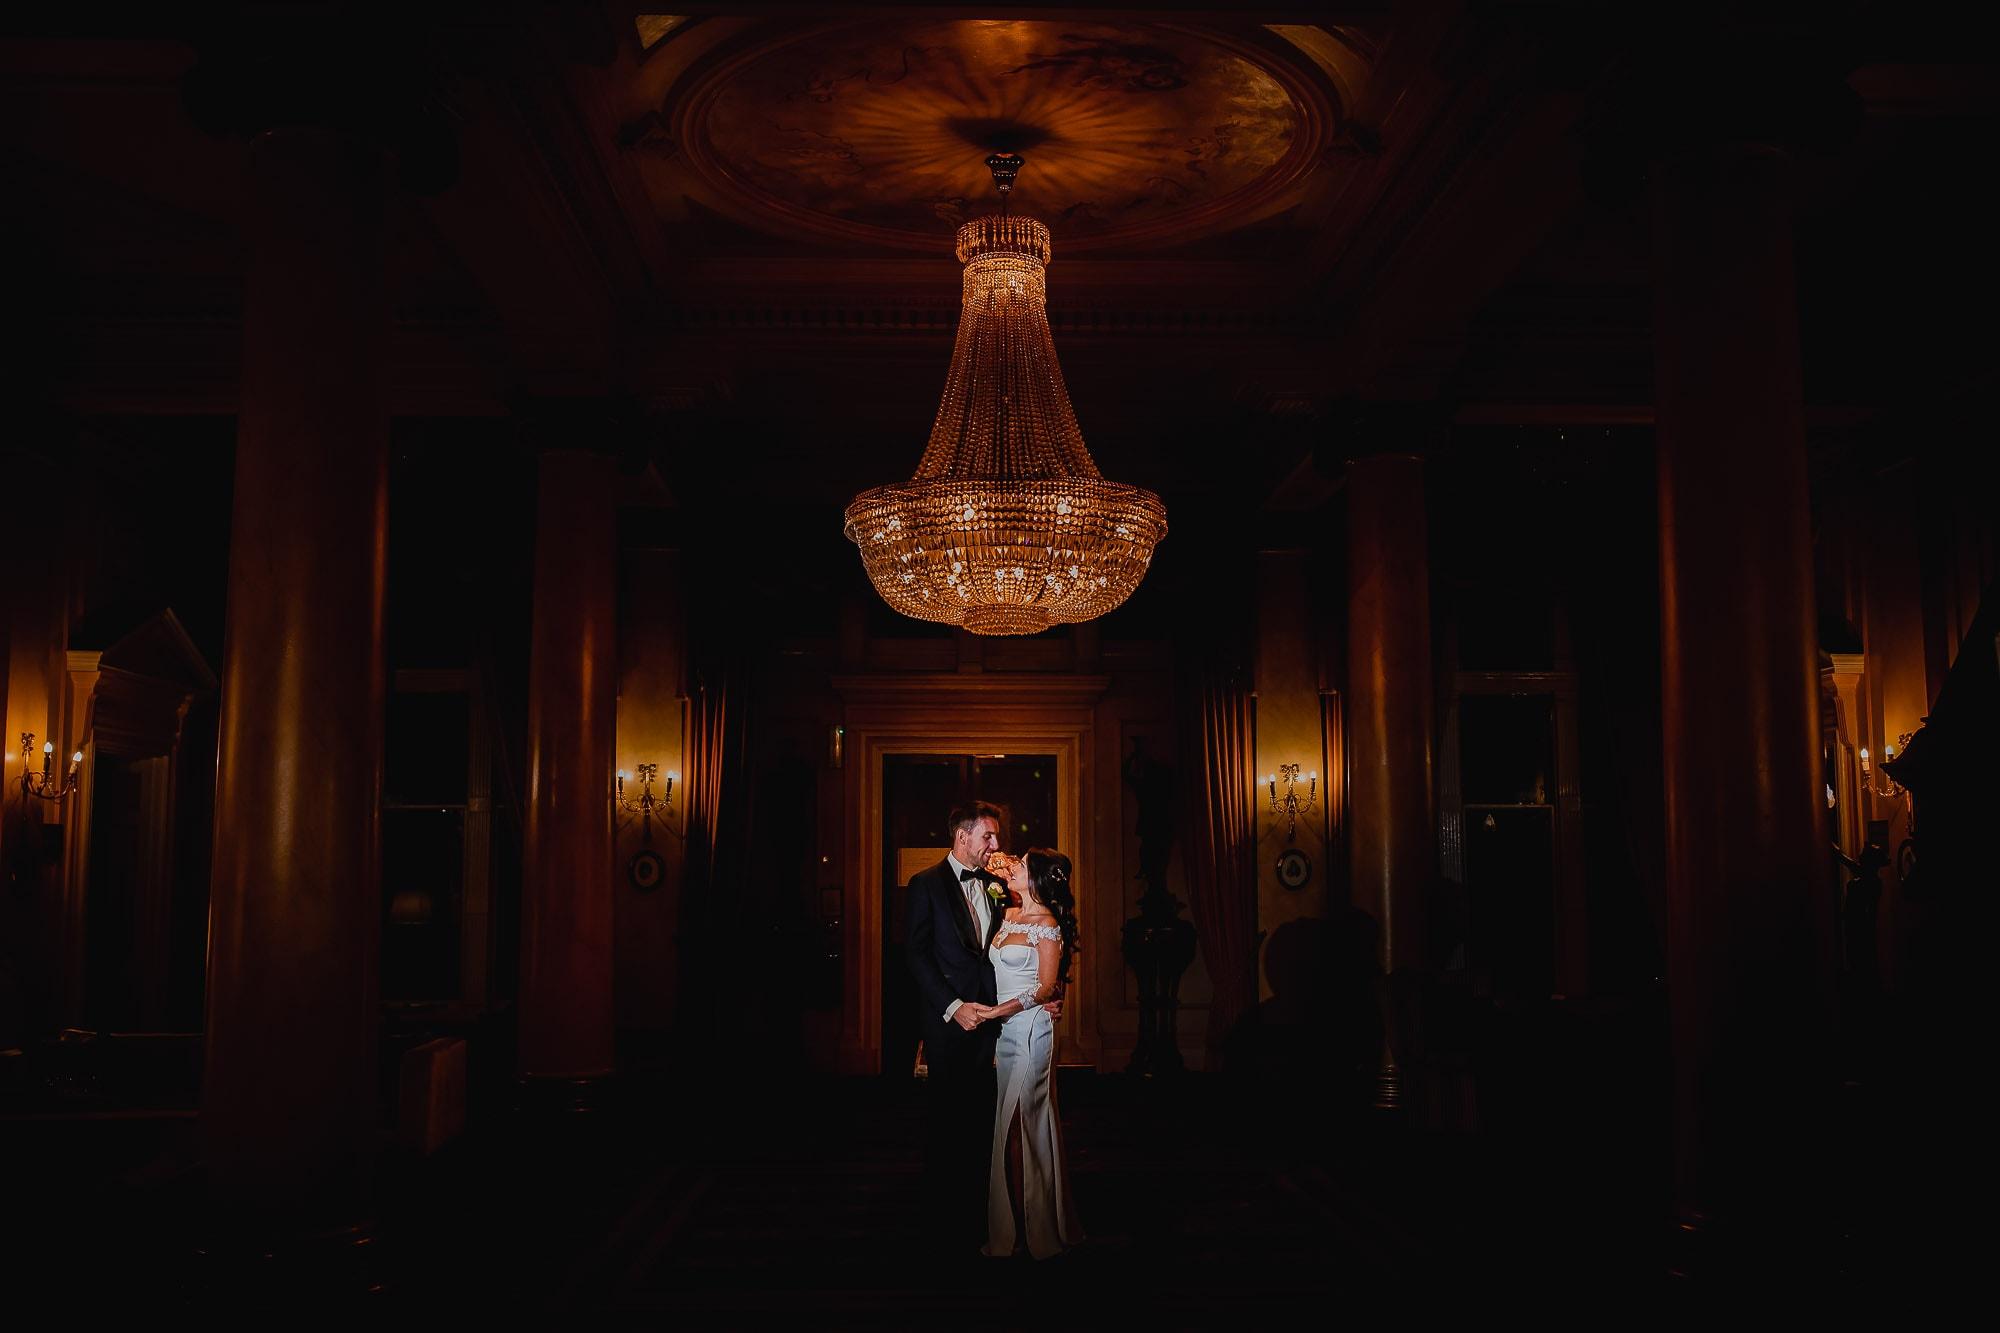 Couples wedding portrait under golden chandelier.